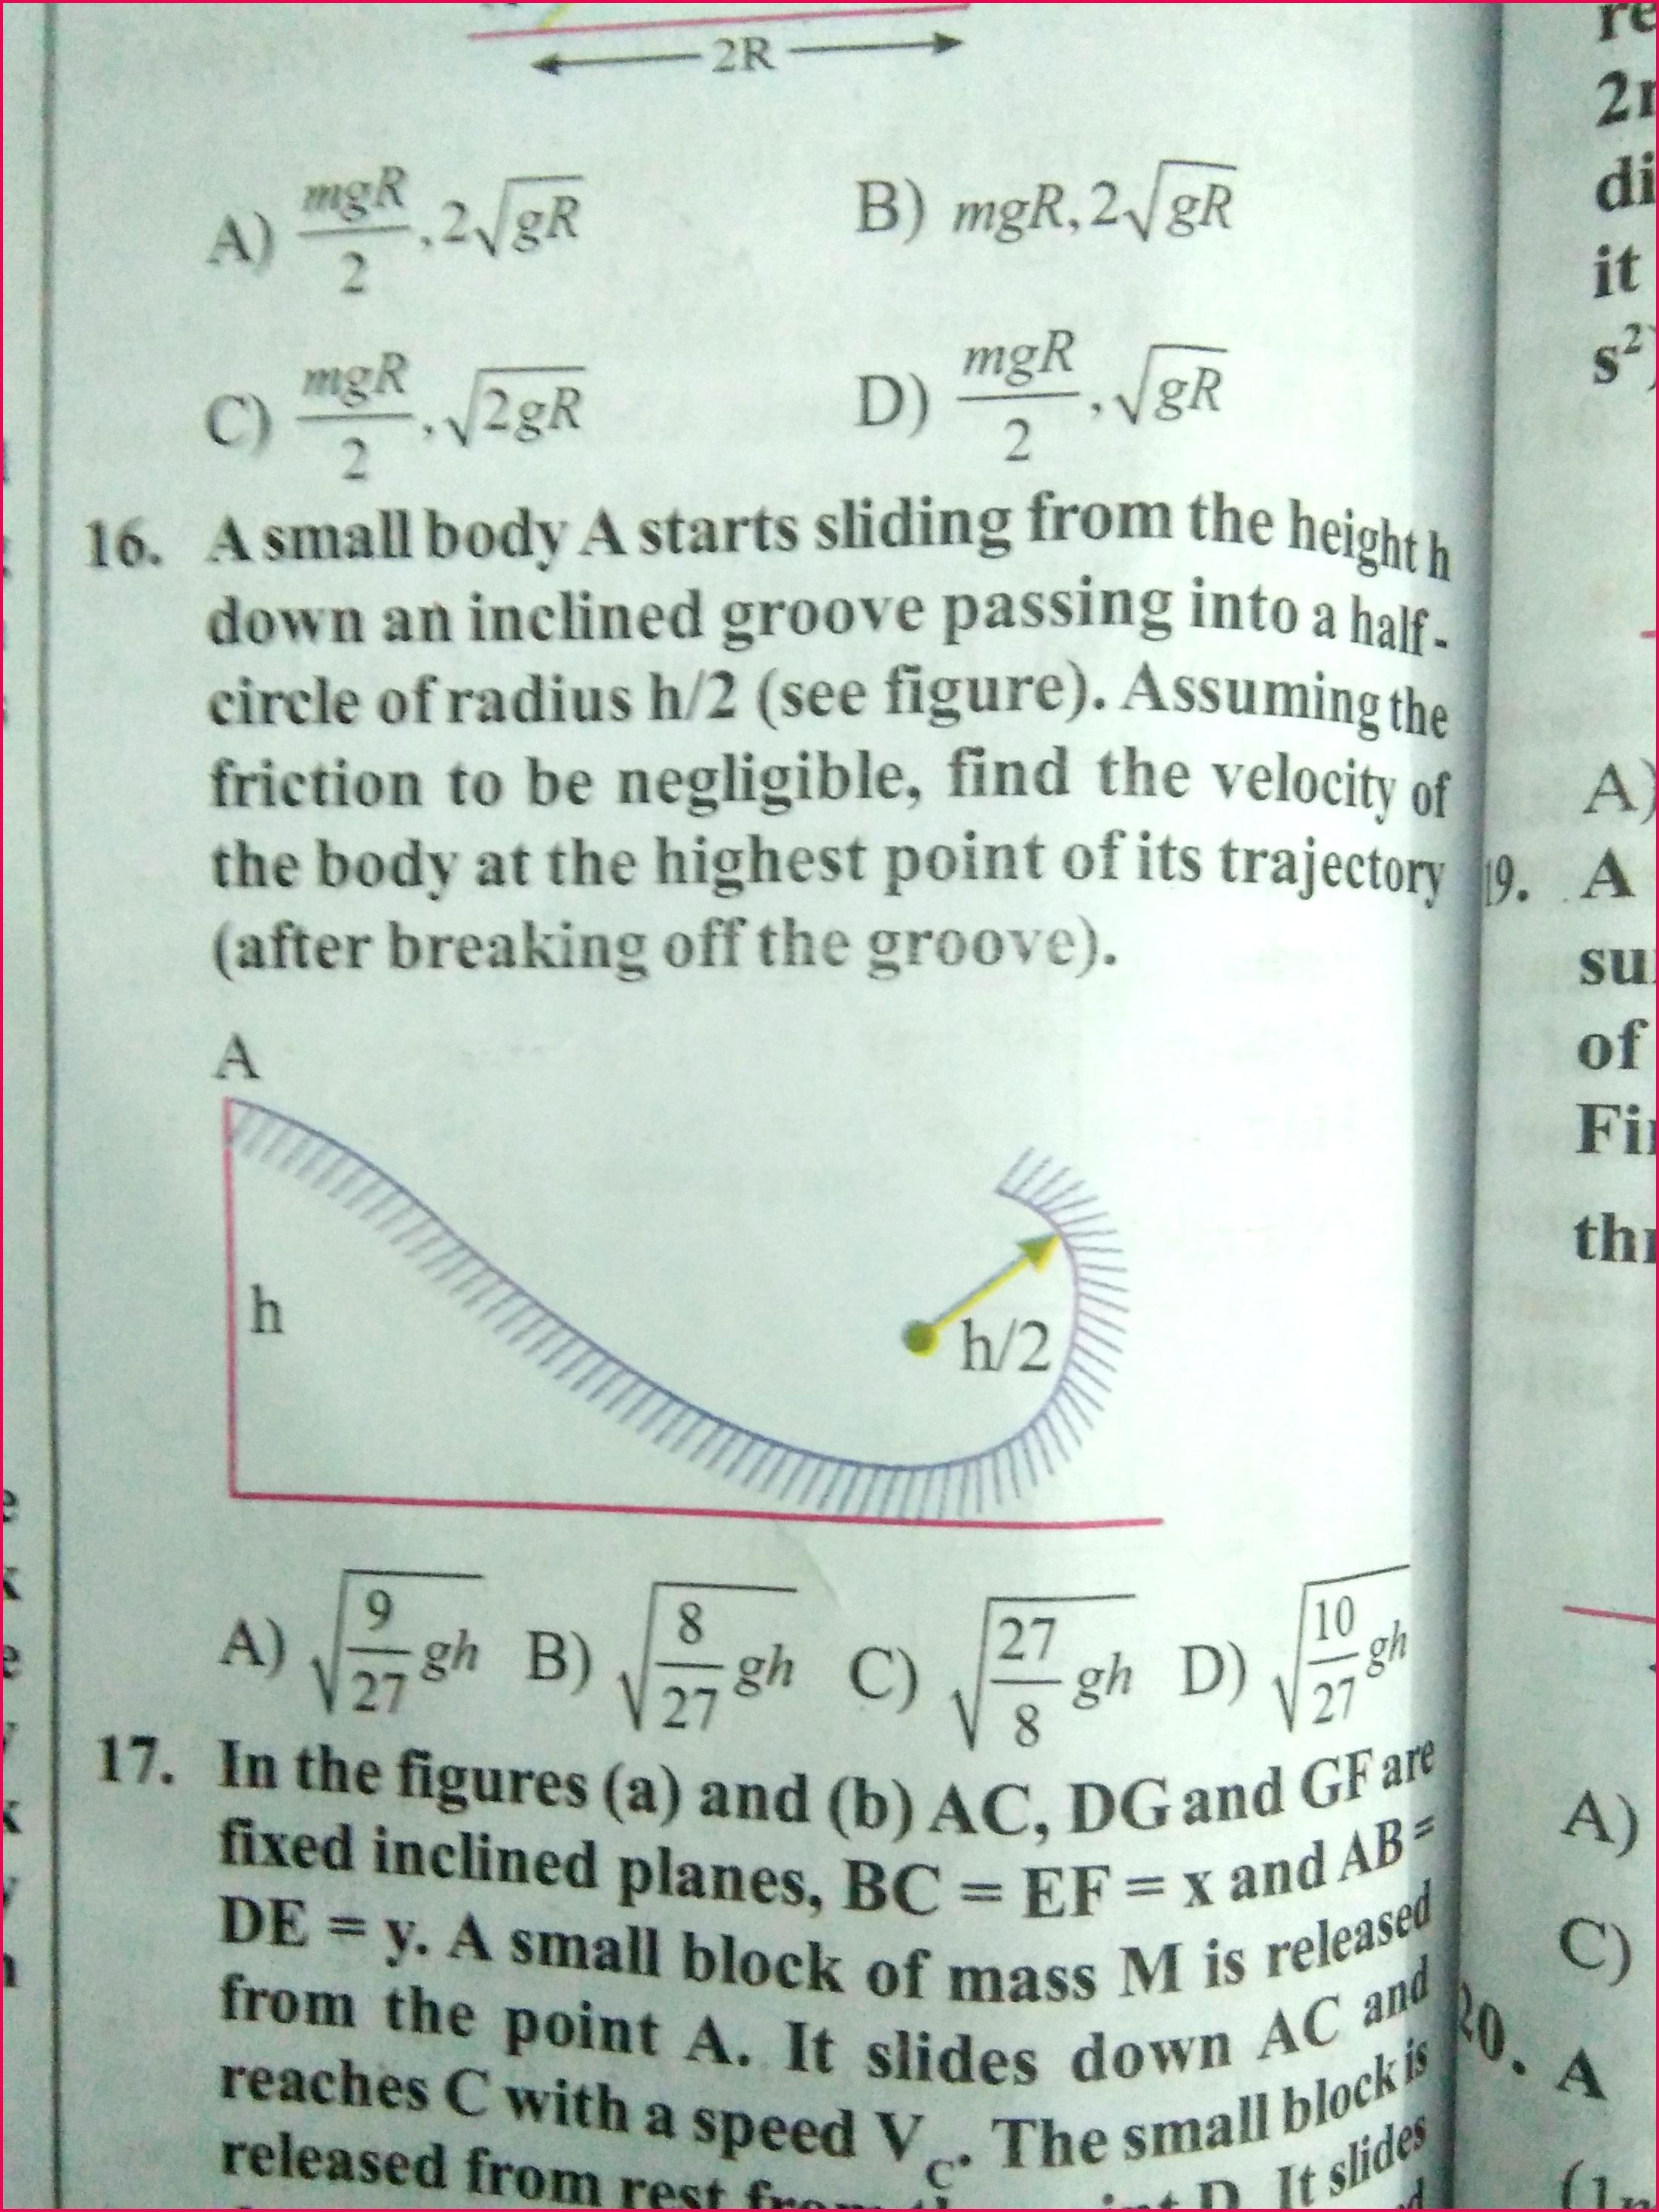 Plz solve the ques no 16